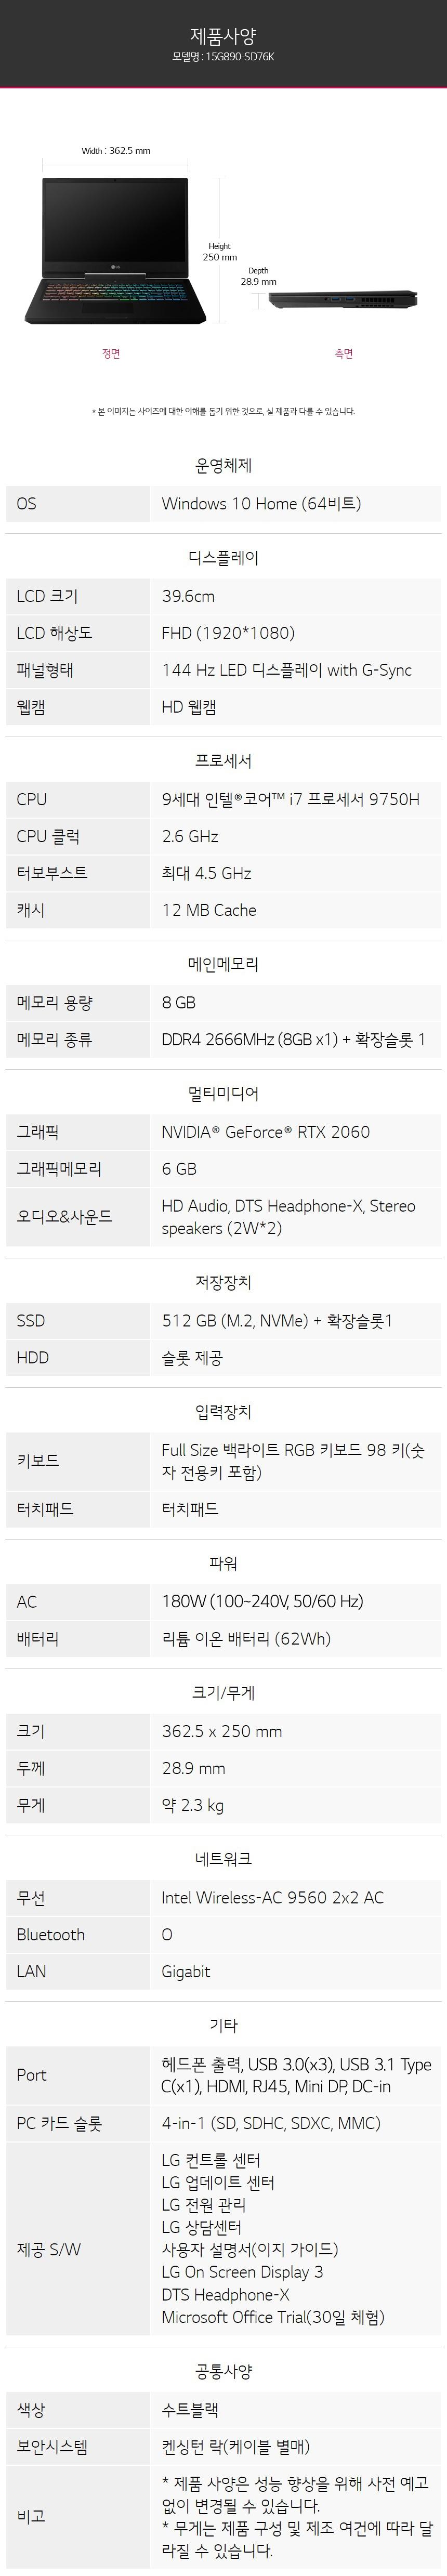 spec_15G890-SD76K.jpg